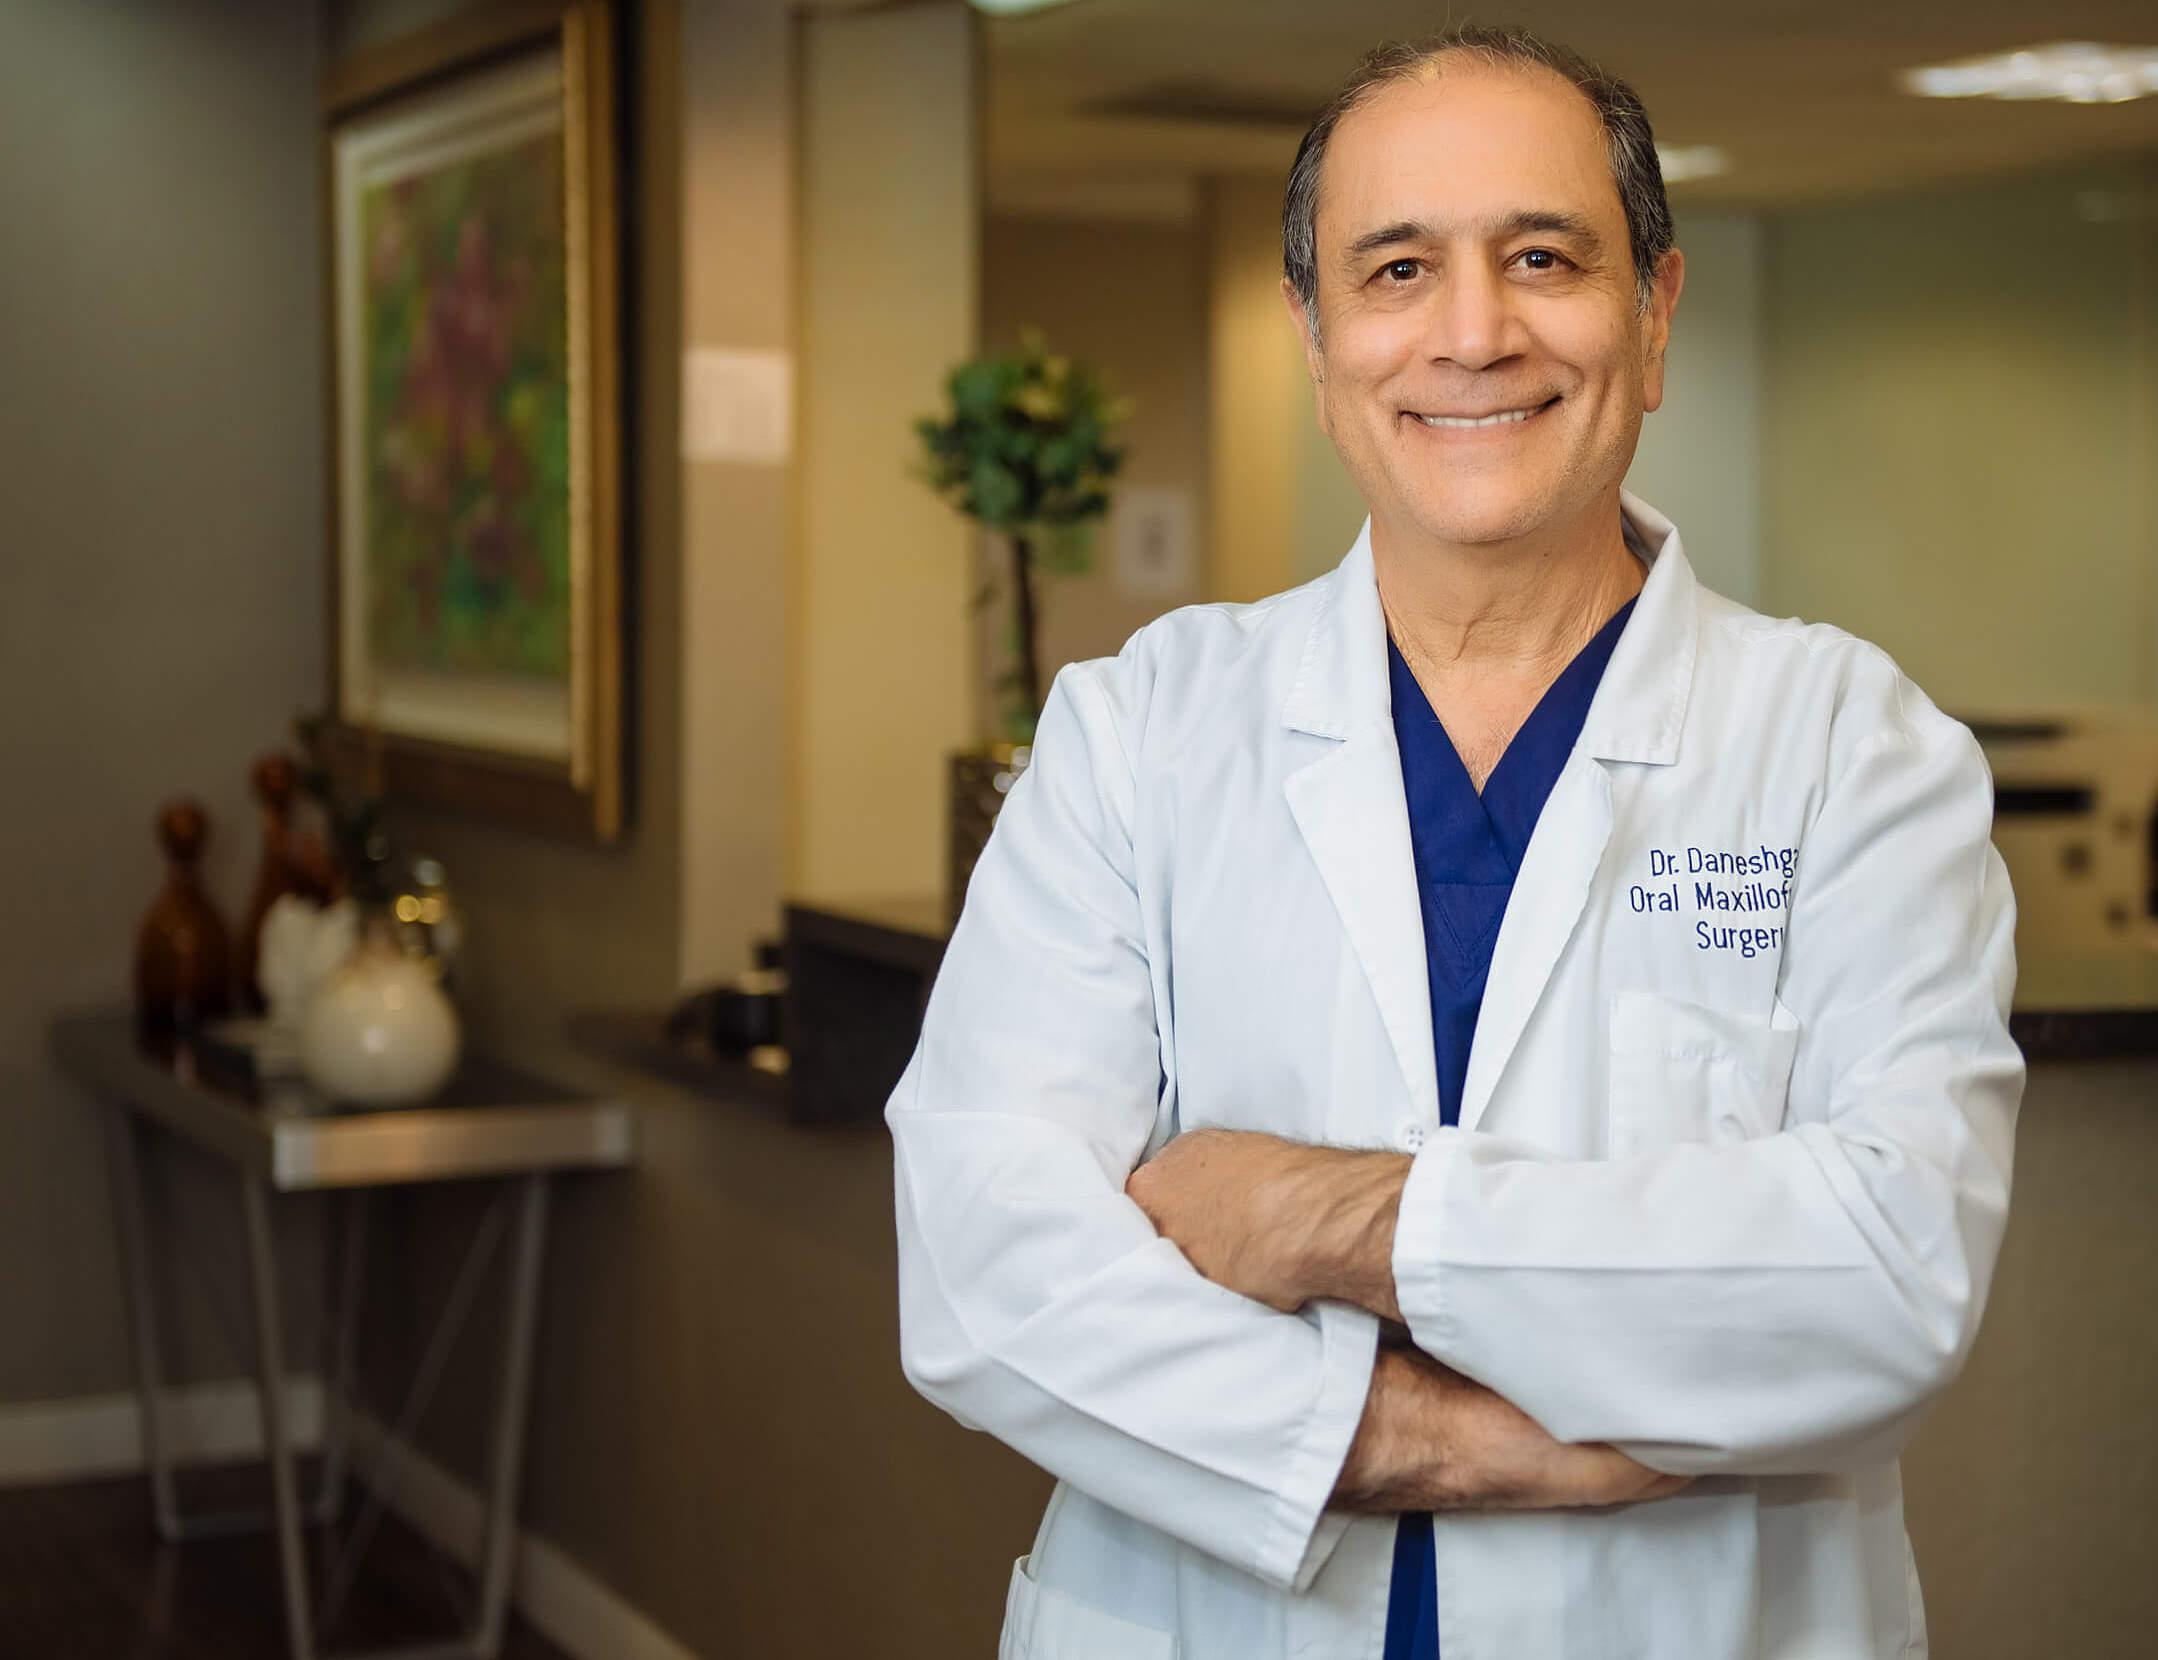 Dr. Shaun Daneshgar